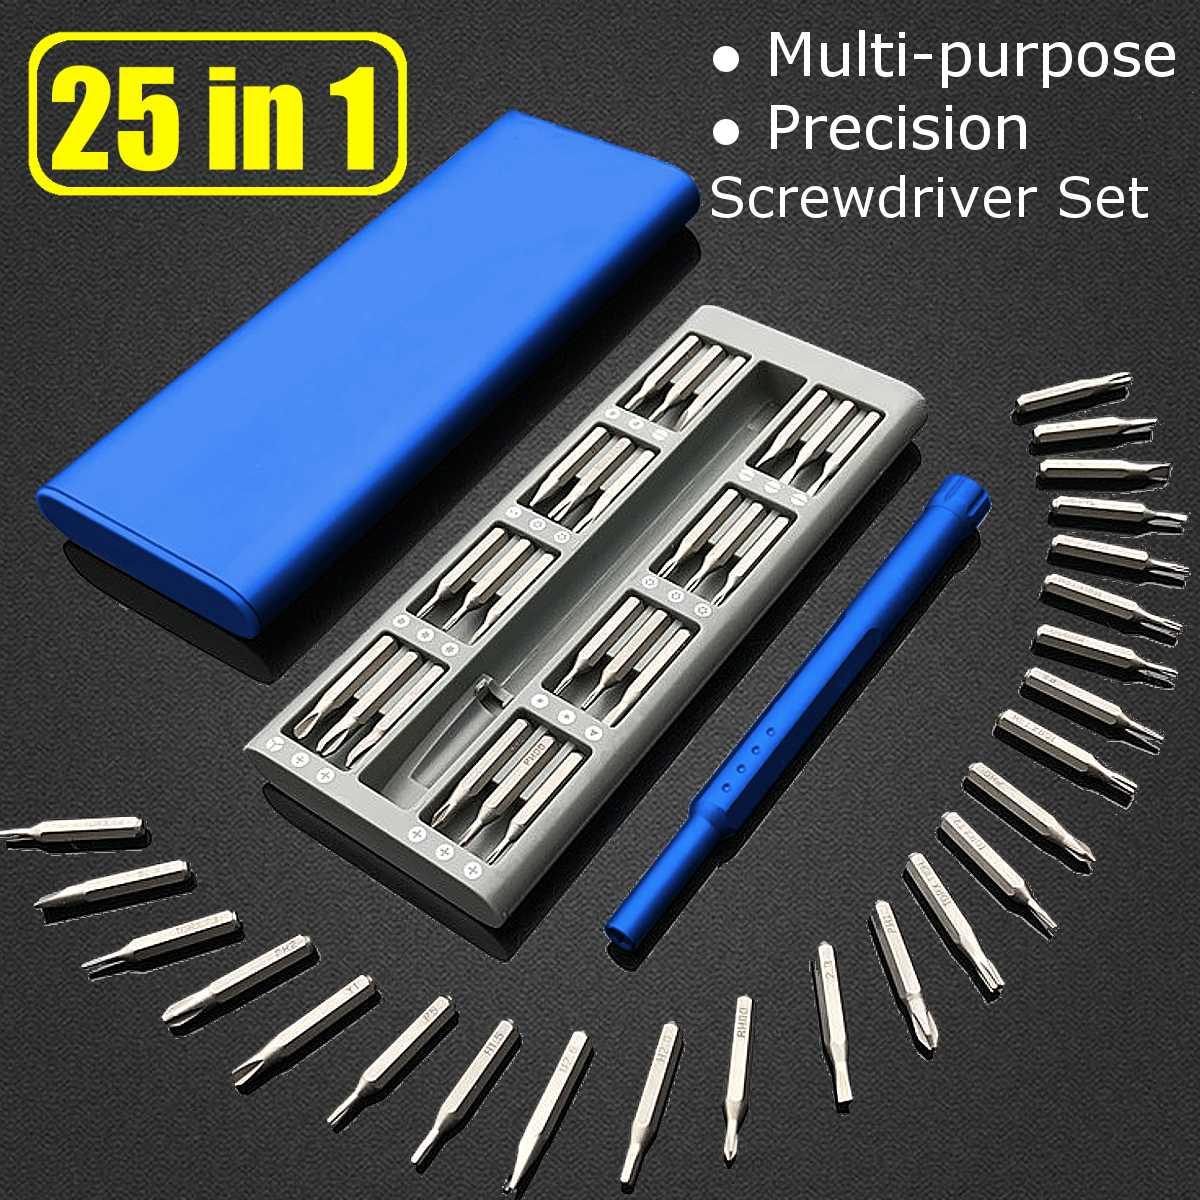 Xiaomi Mijia Wiha Daily Use Blue Mini Screwdriver Kit 25 Precision Magnetic  Bits Box Screw Driver xiaomi Smart Home Set